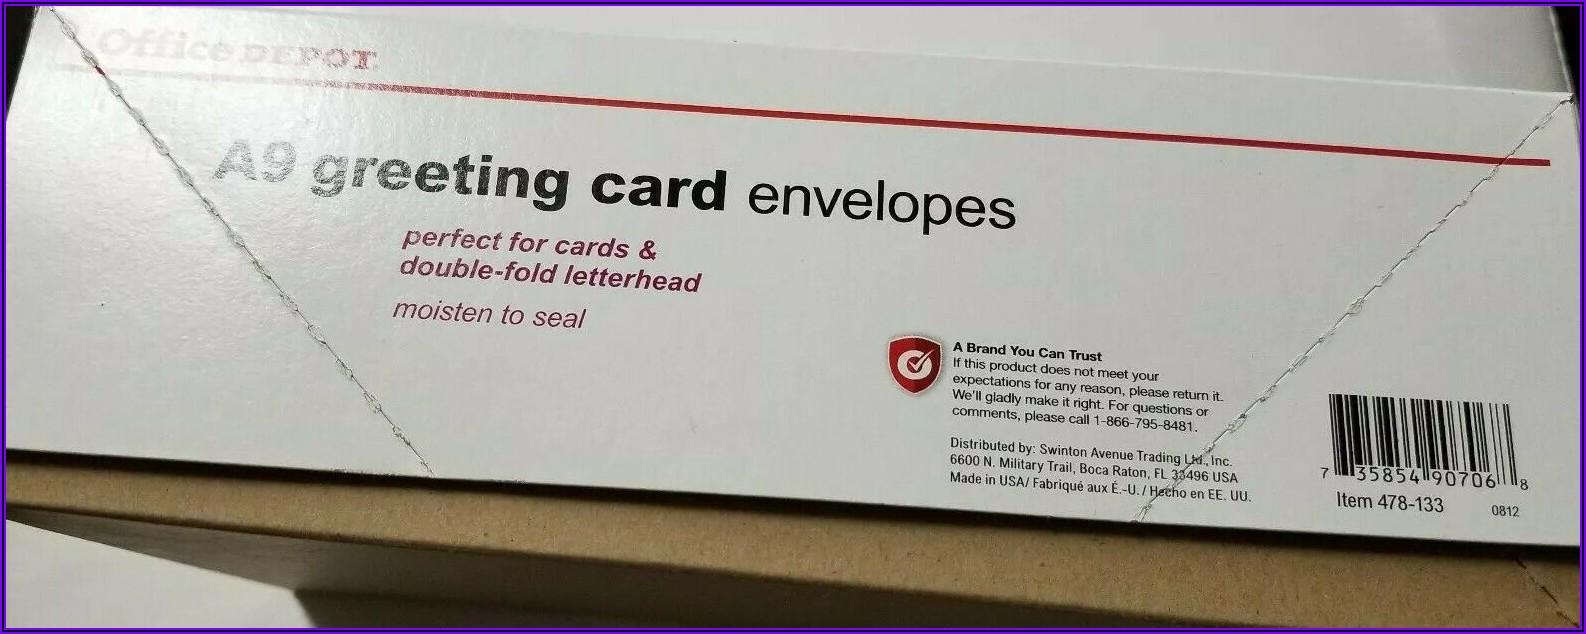 Office Depot A9 Envelopes